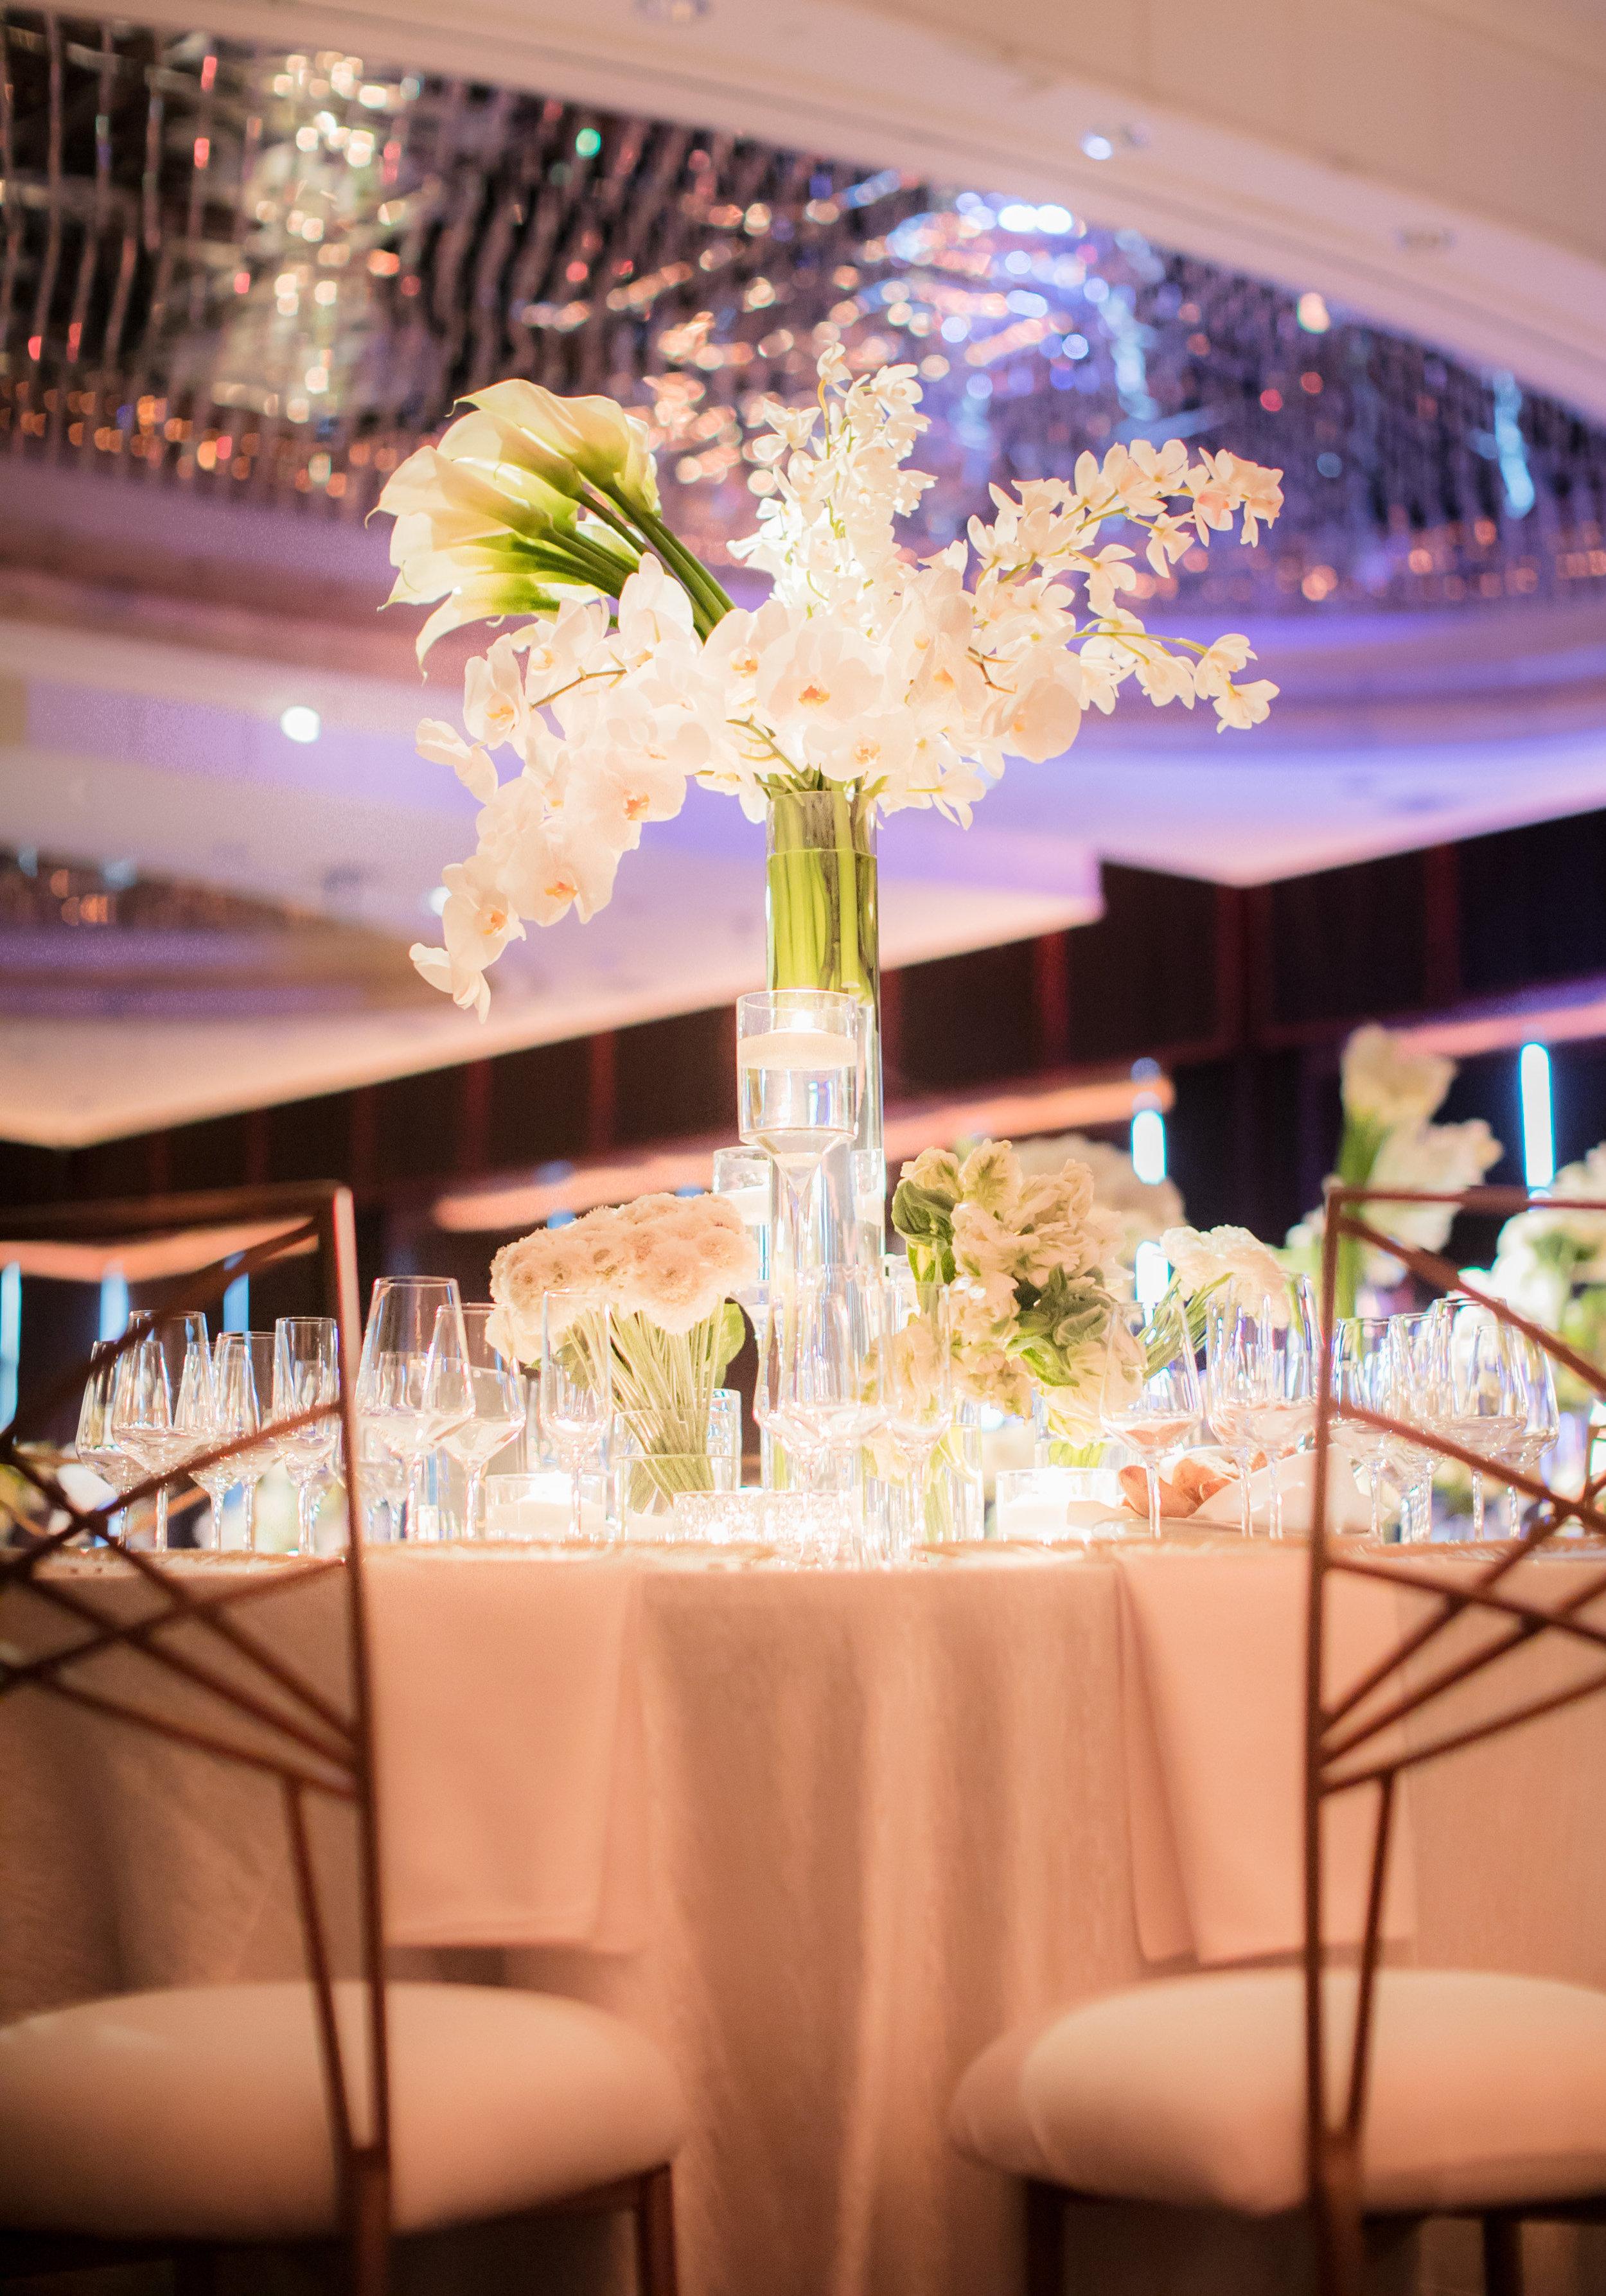 Andrea-Freeman-Events-NY-Wedding-Planner-Mandarin-Oriental-Wedding-14.jpg